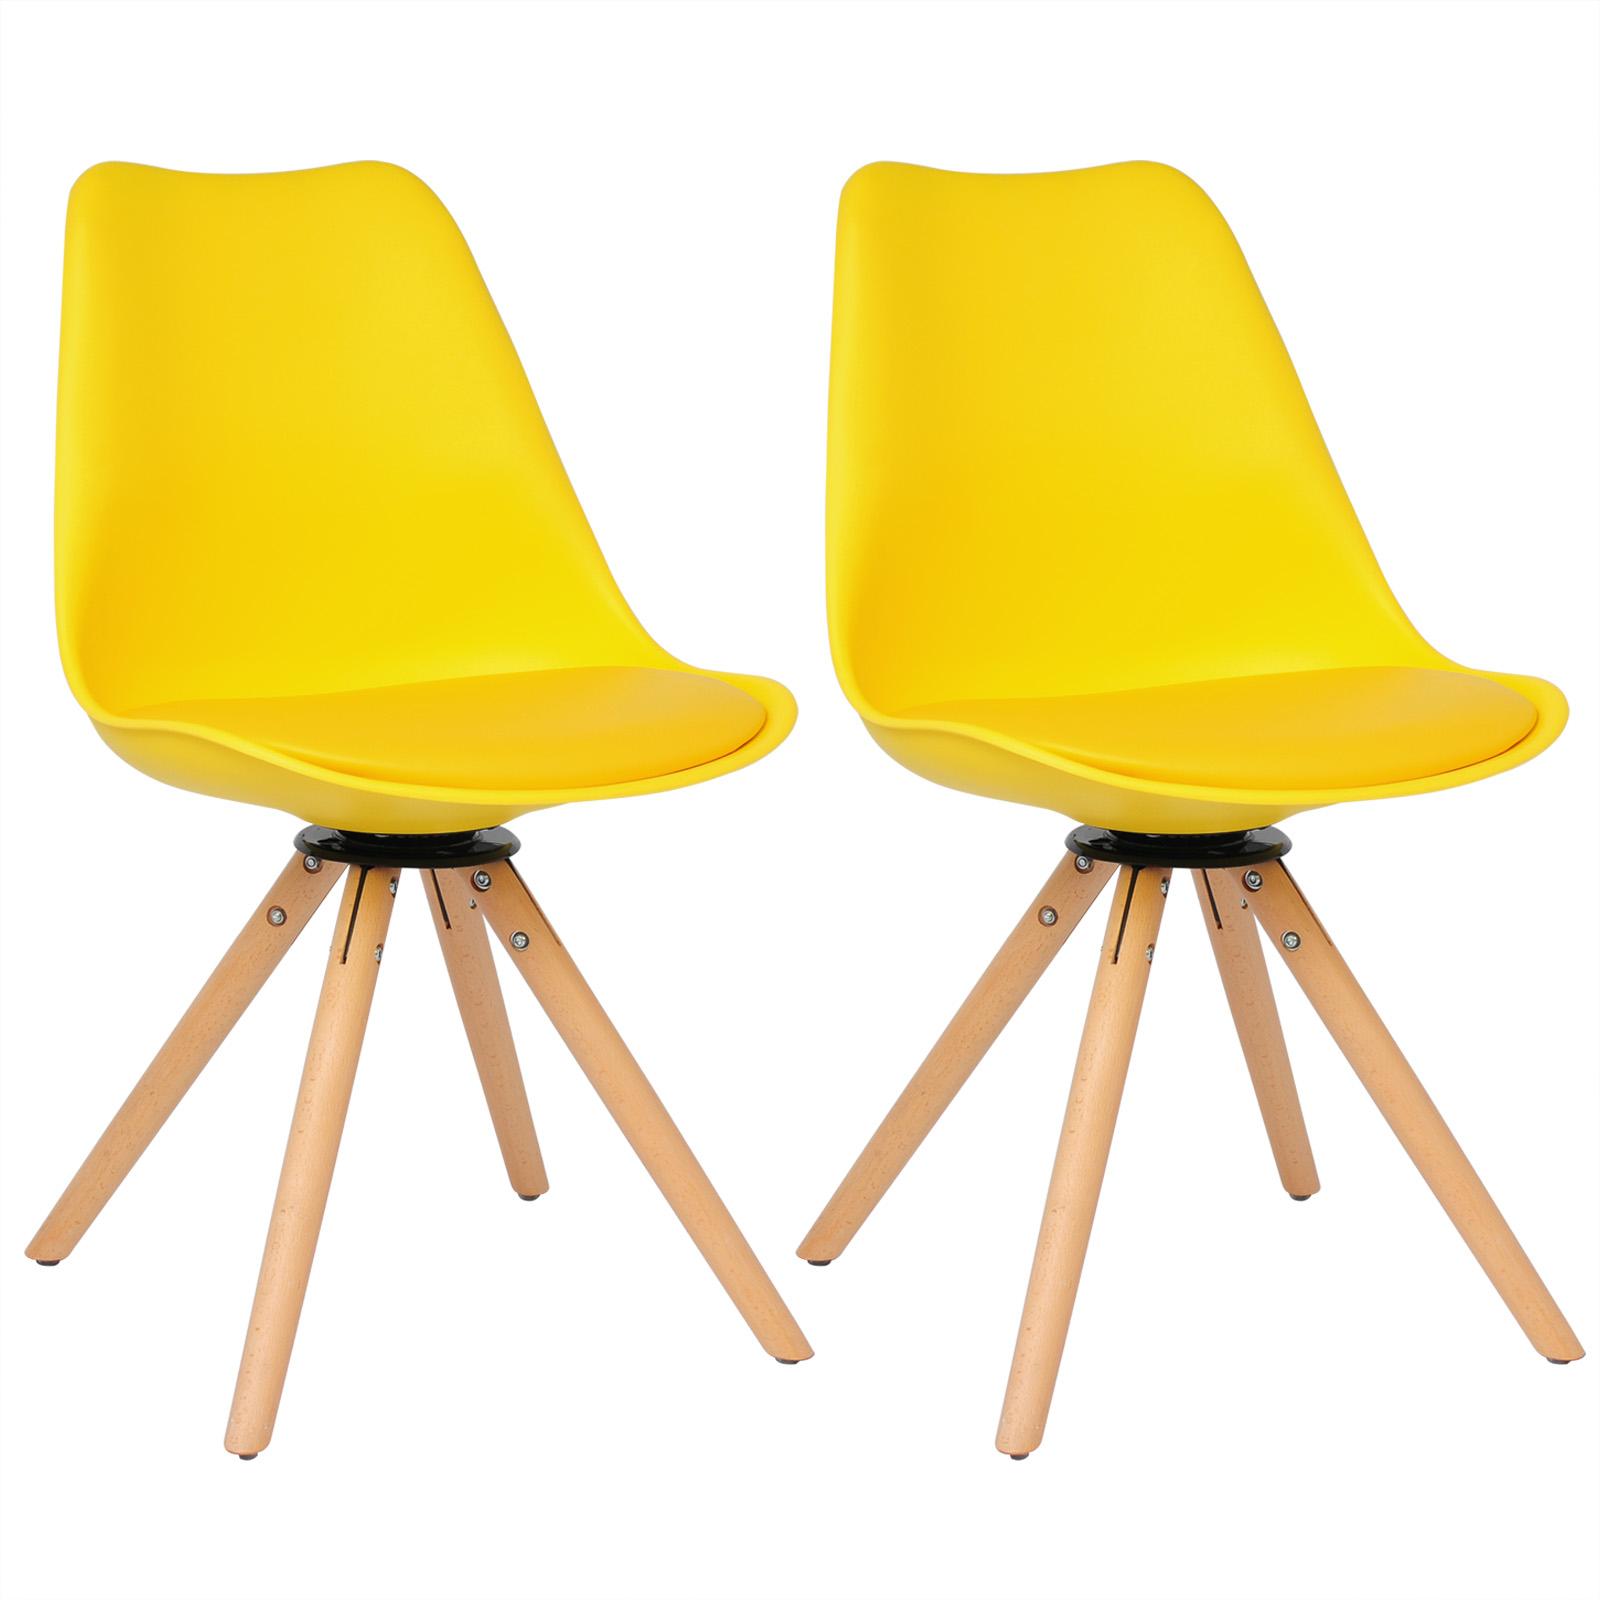 Perfekt 2 X Esszimmerstuehle Esszimmerstuhl Holz Design Stuhl Kuechenstuhl